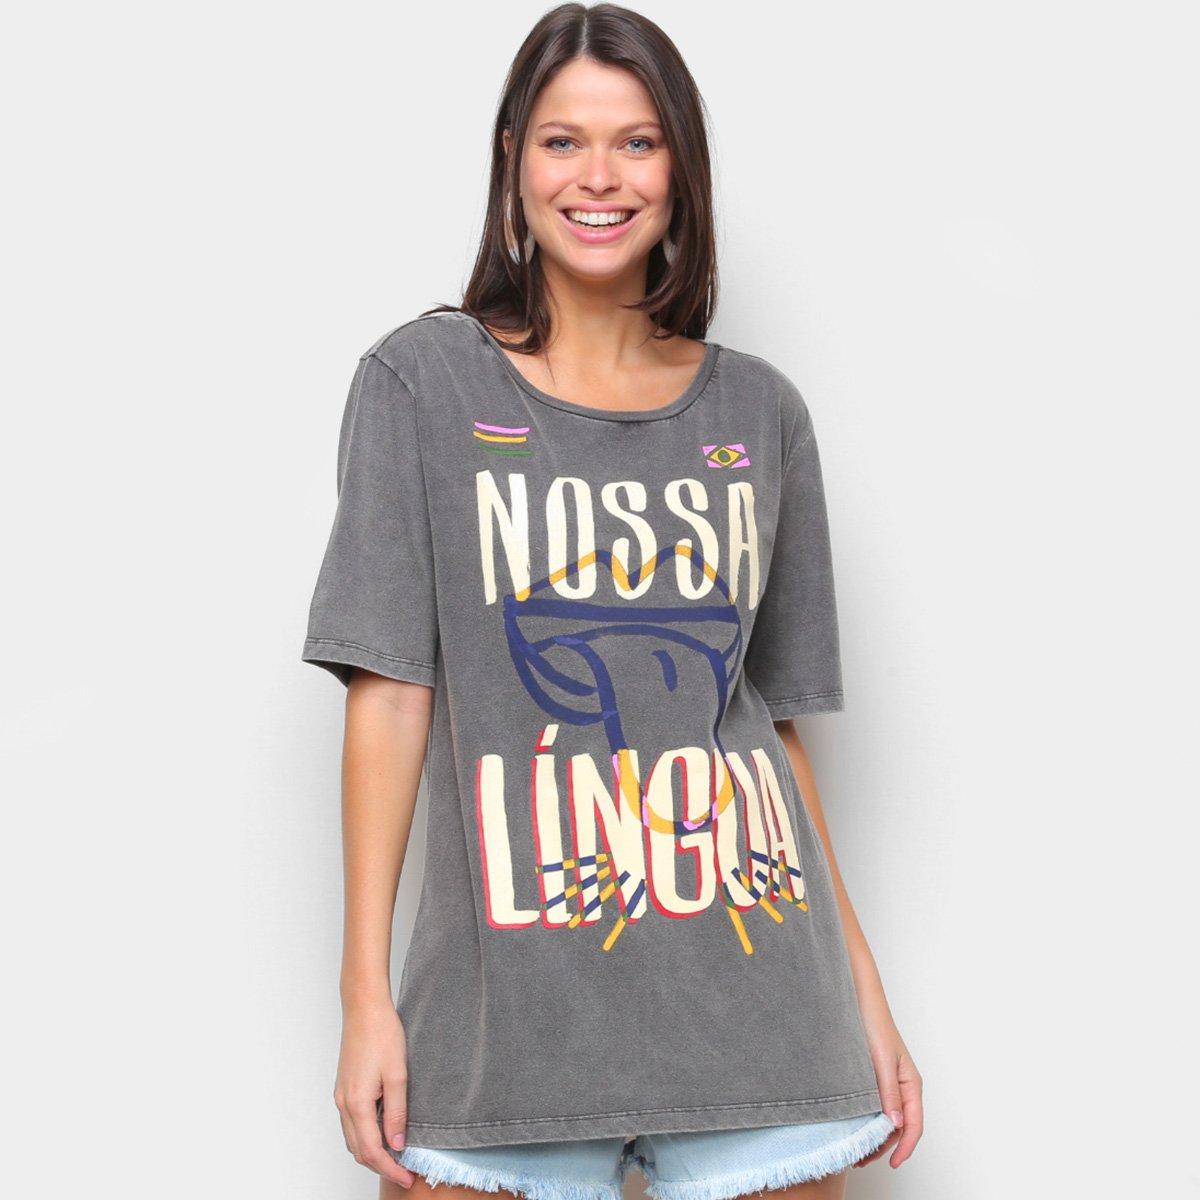 Blusa Farm T-Shirt Língua Brasileira Feminina